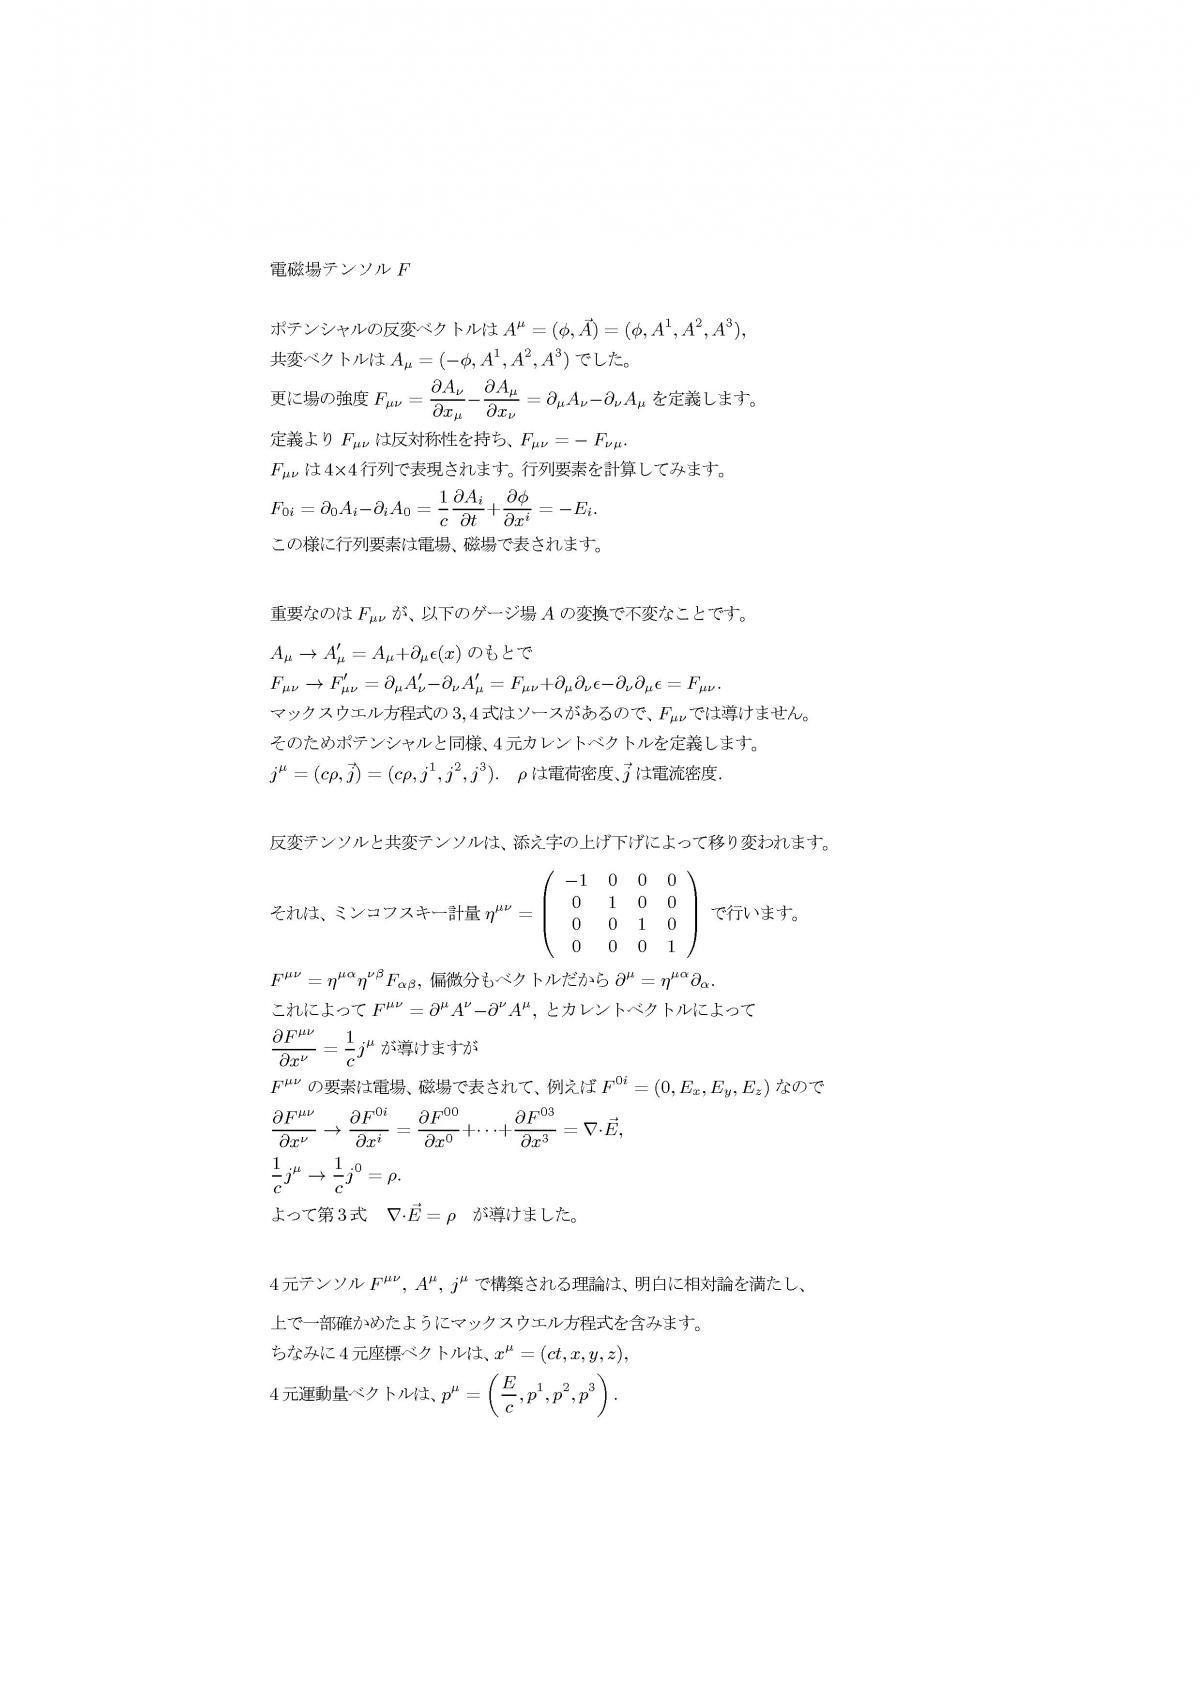 ggen02.jpg